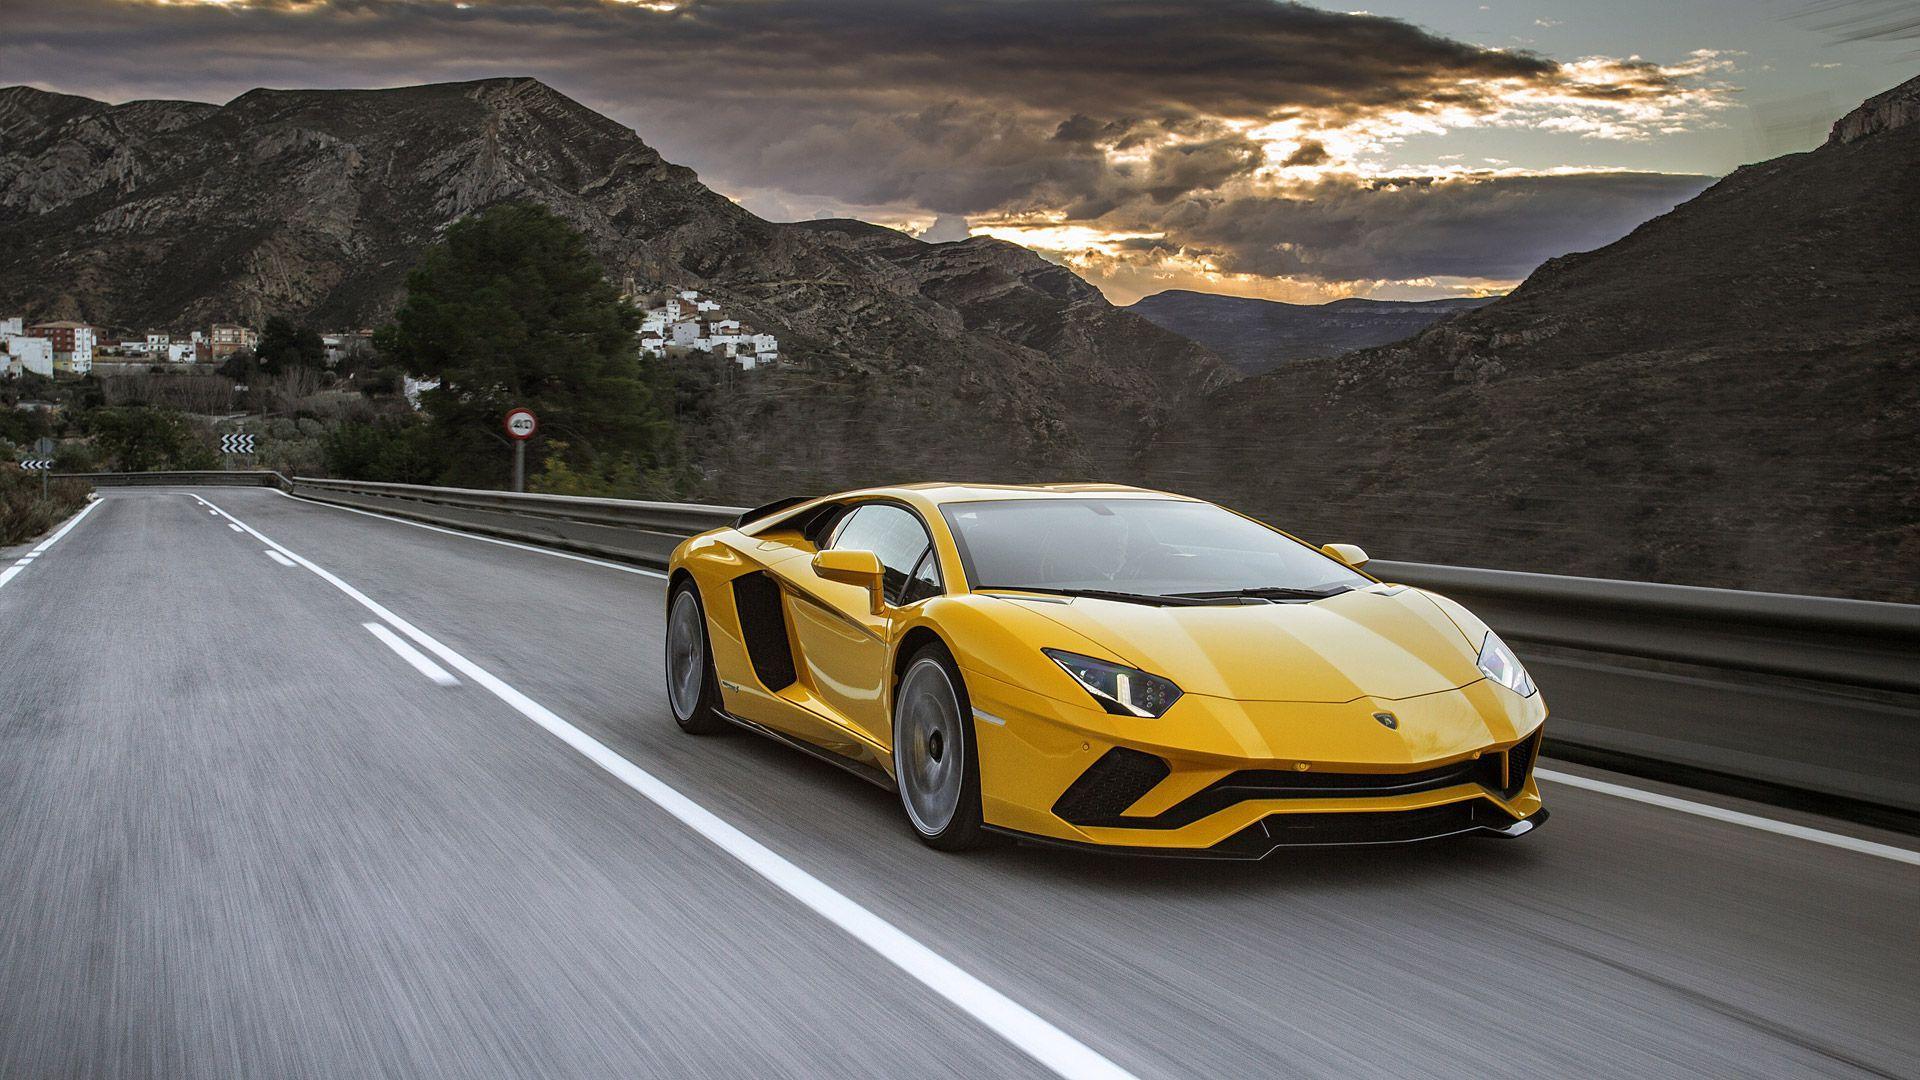 Lamborghini Aventador S Wallpapers - Wallpaper Cave